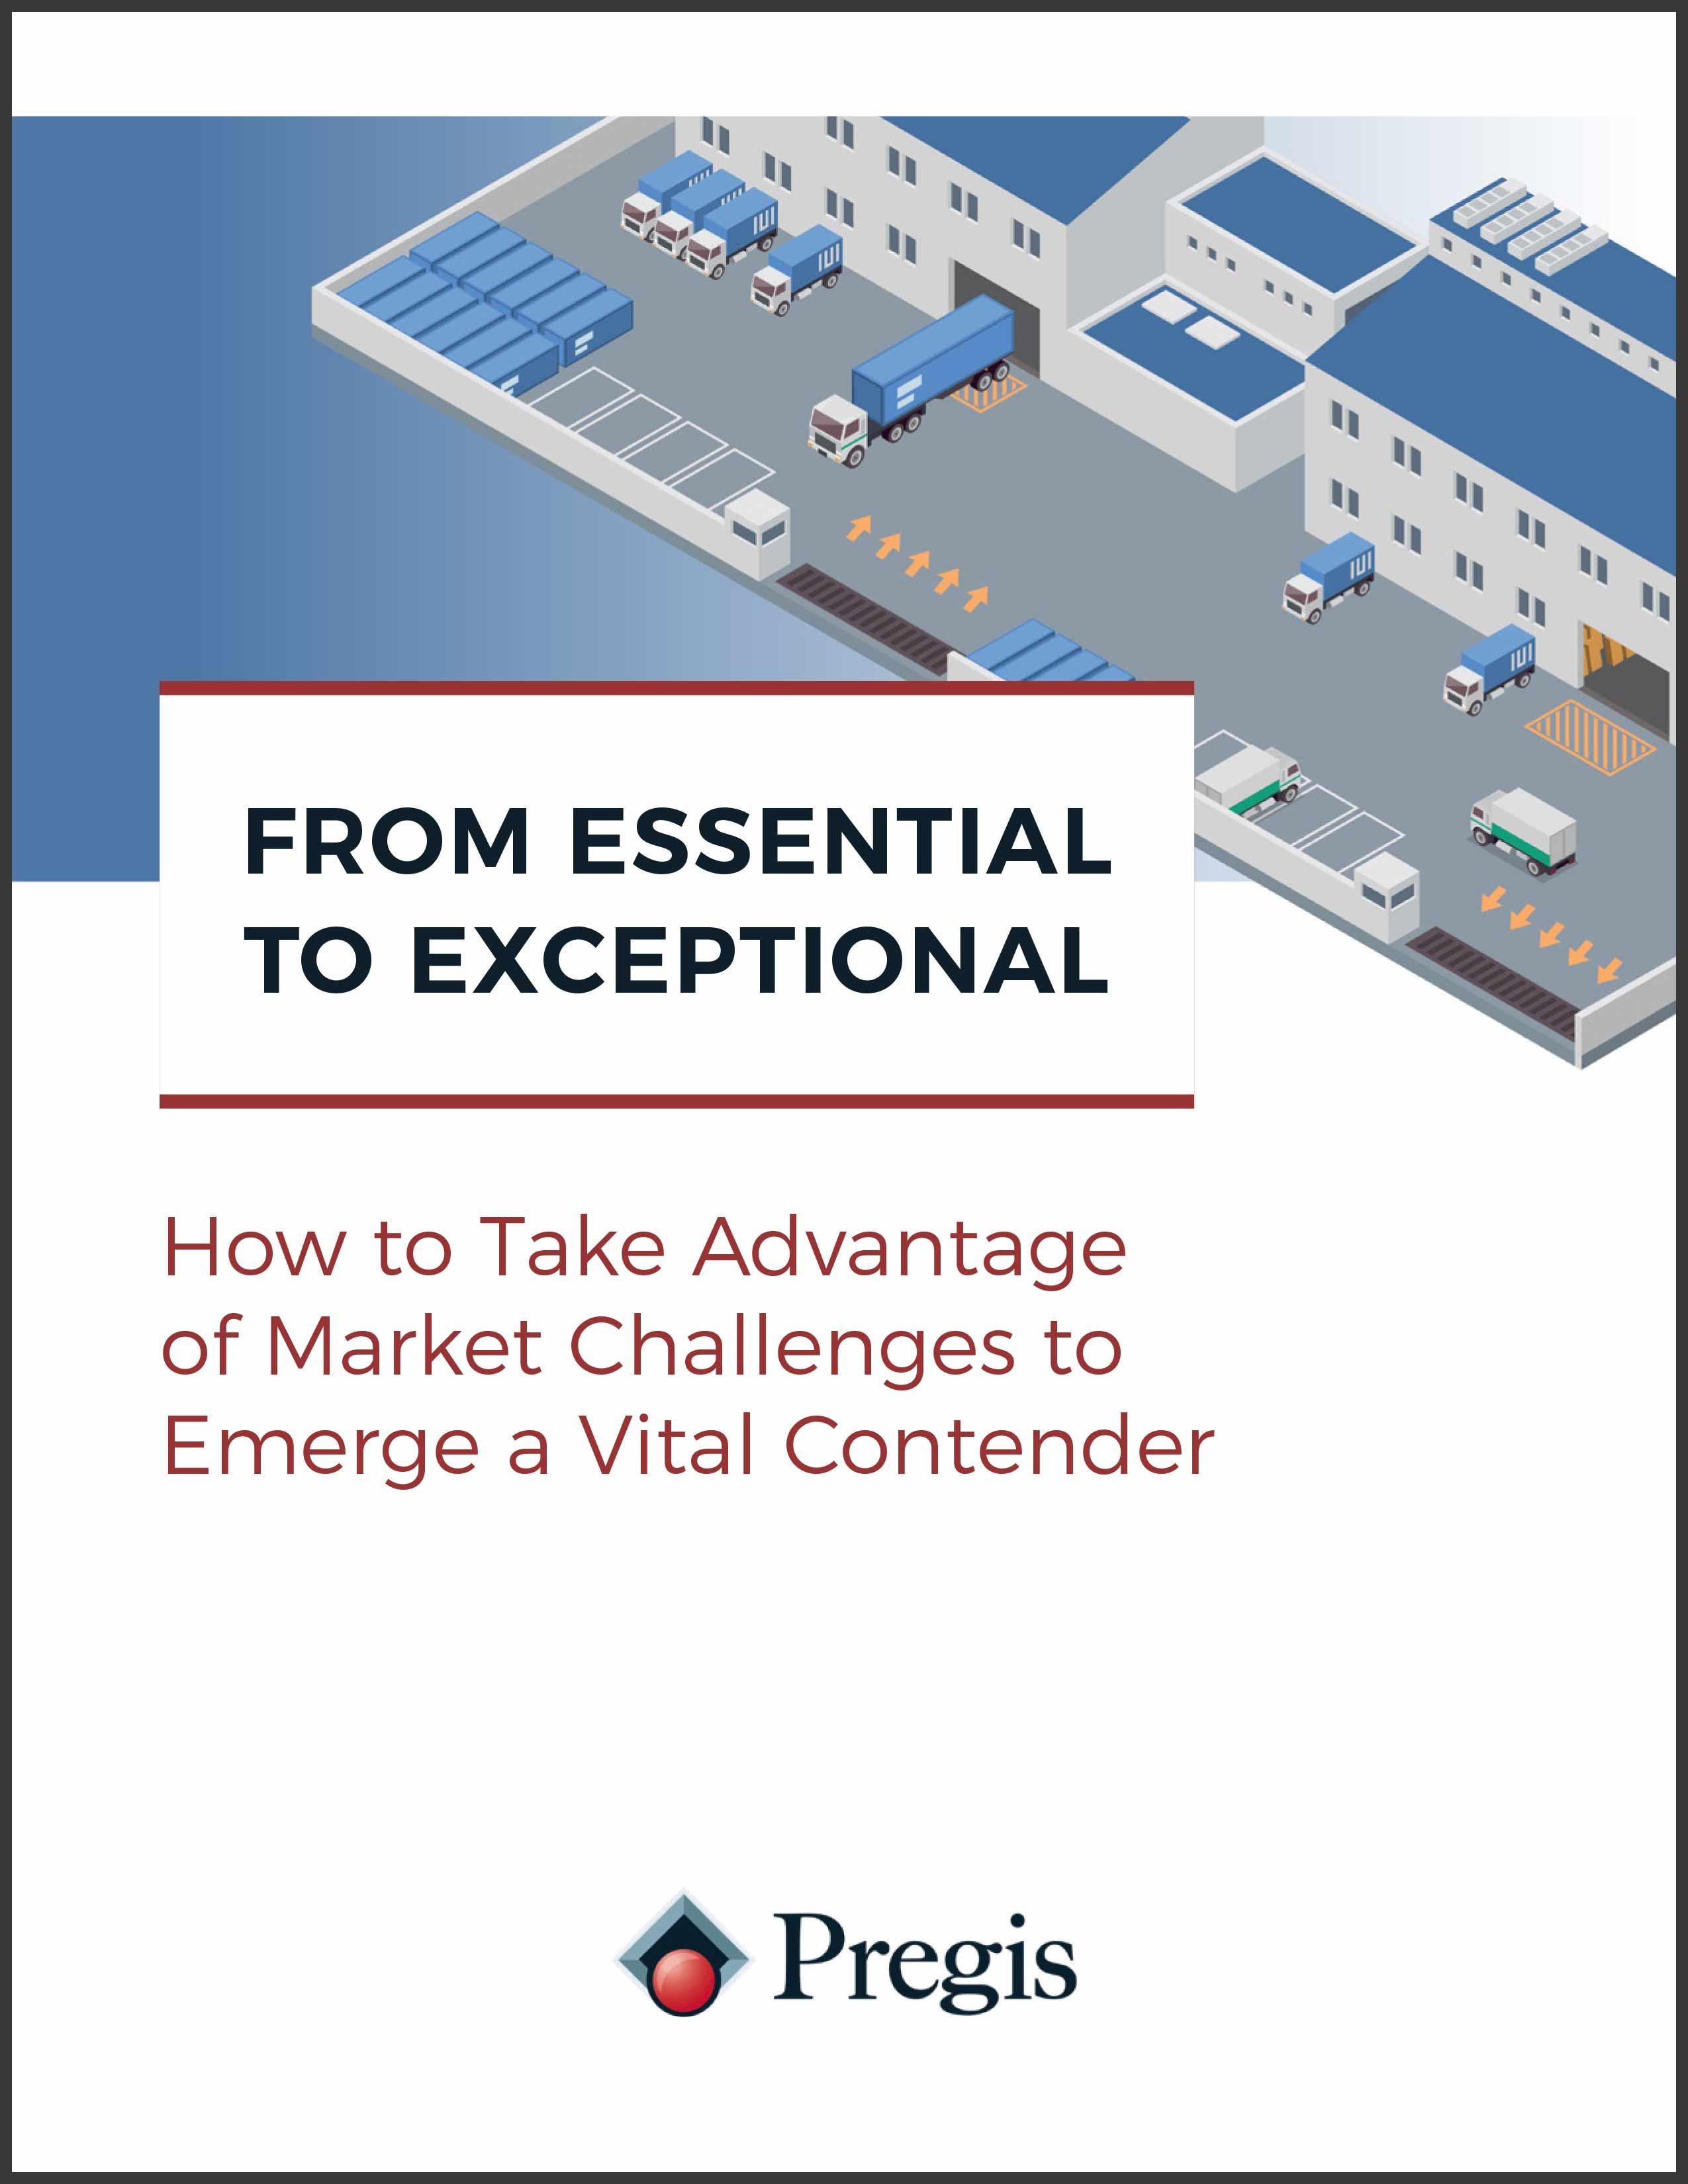 Pregis-ebook-Essential-to-Exceptional-cover.jpg